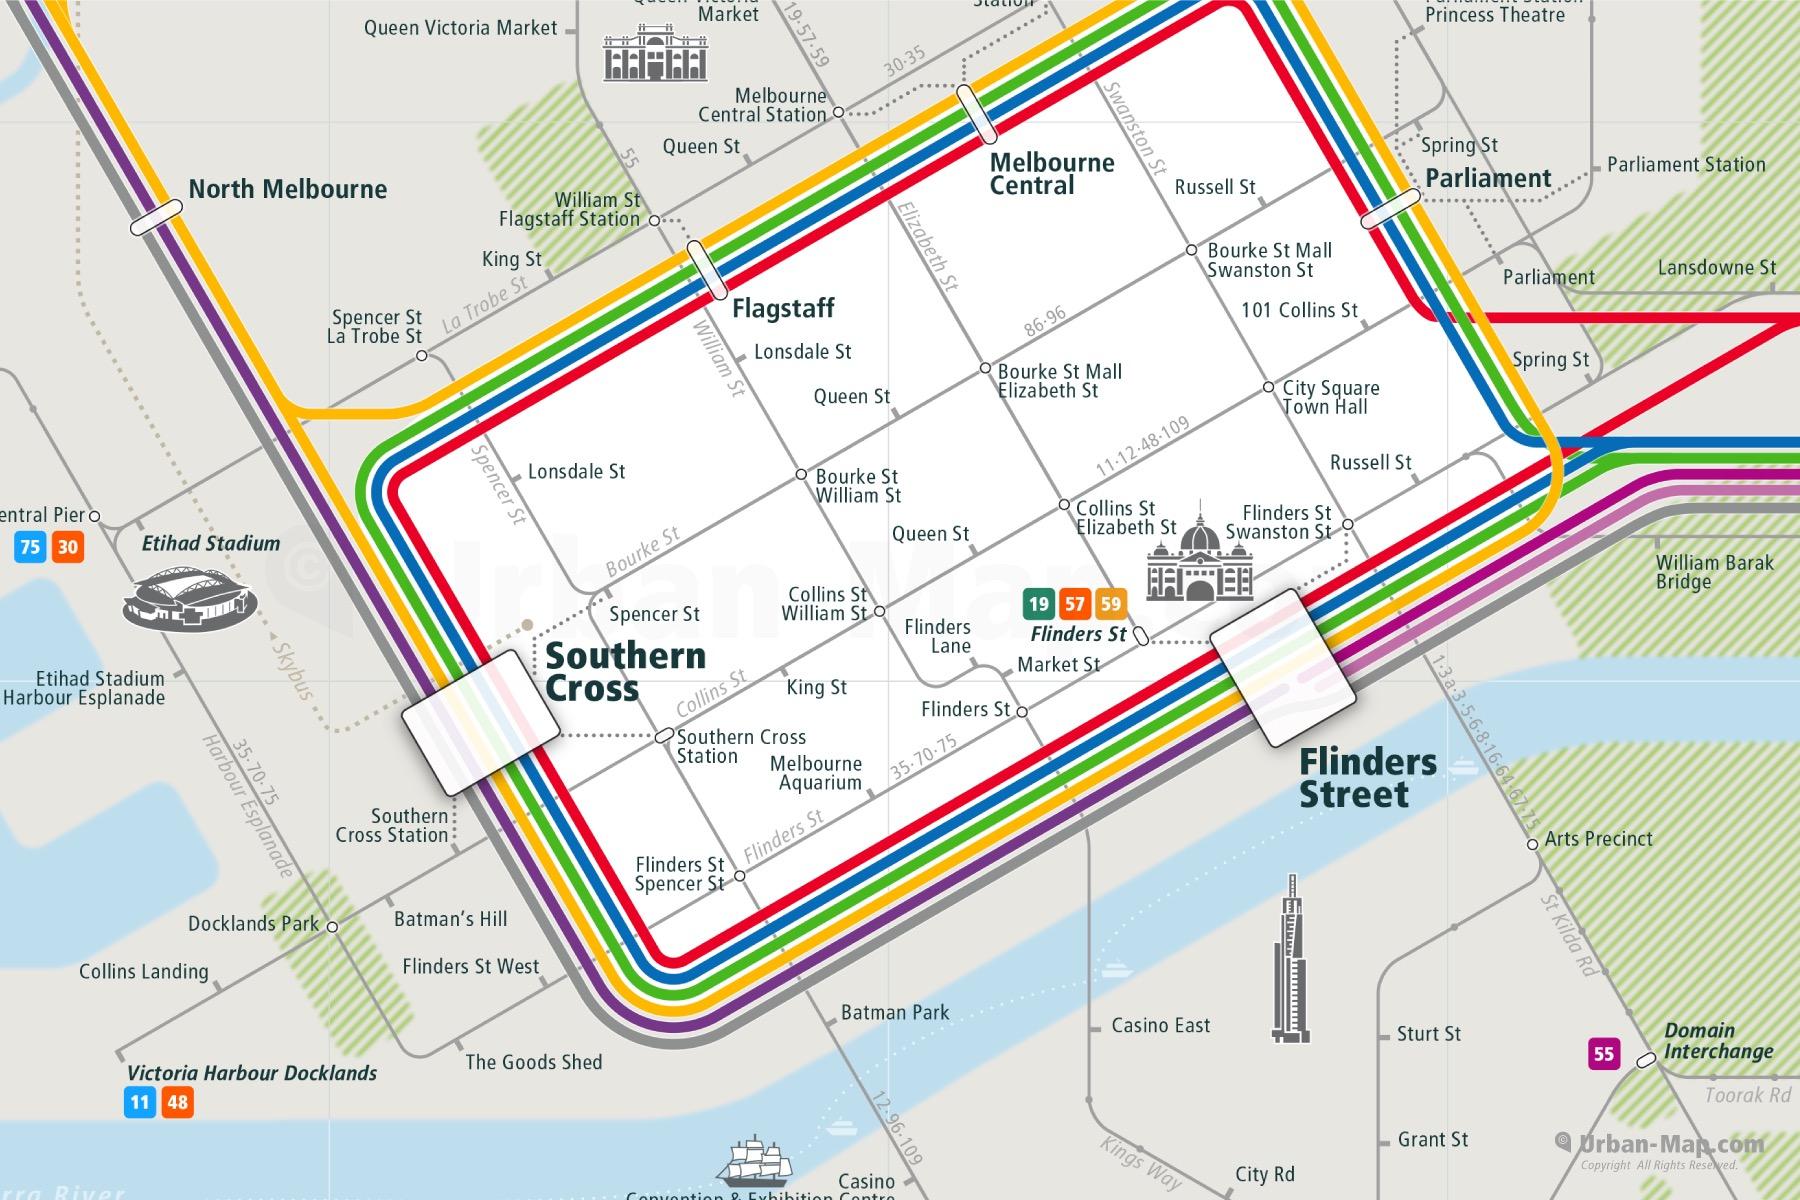 Melbourne City Rail Map shows the train and public transportation routes of tram, commuter train - Close-Up